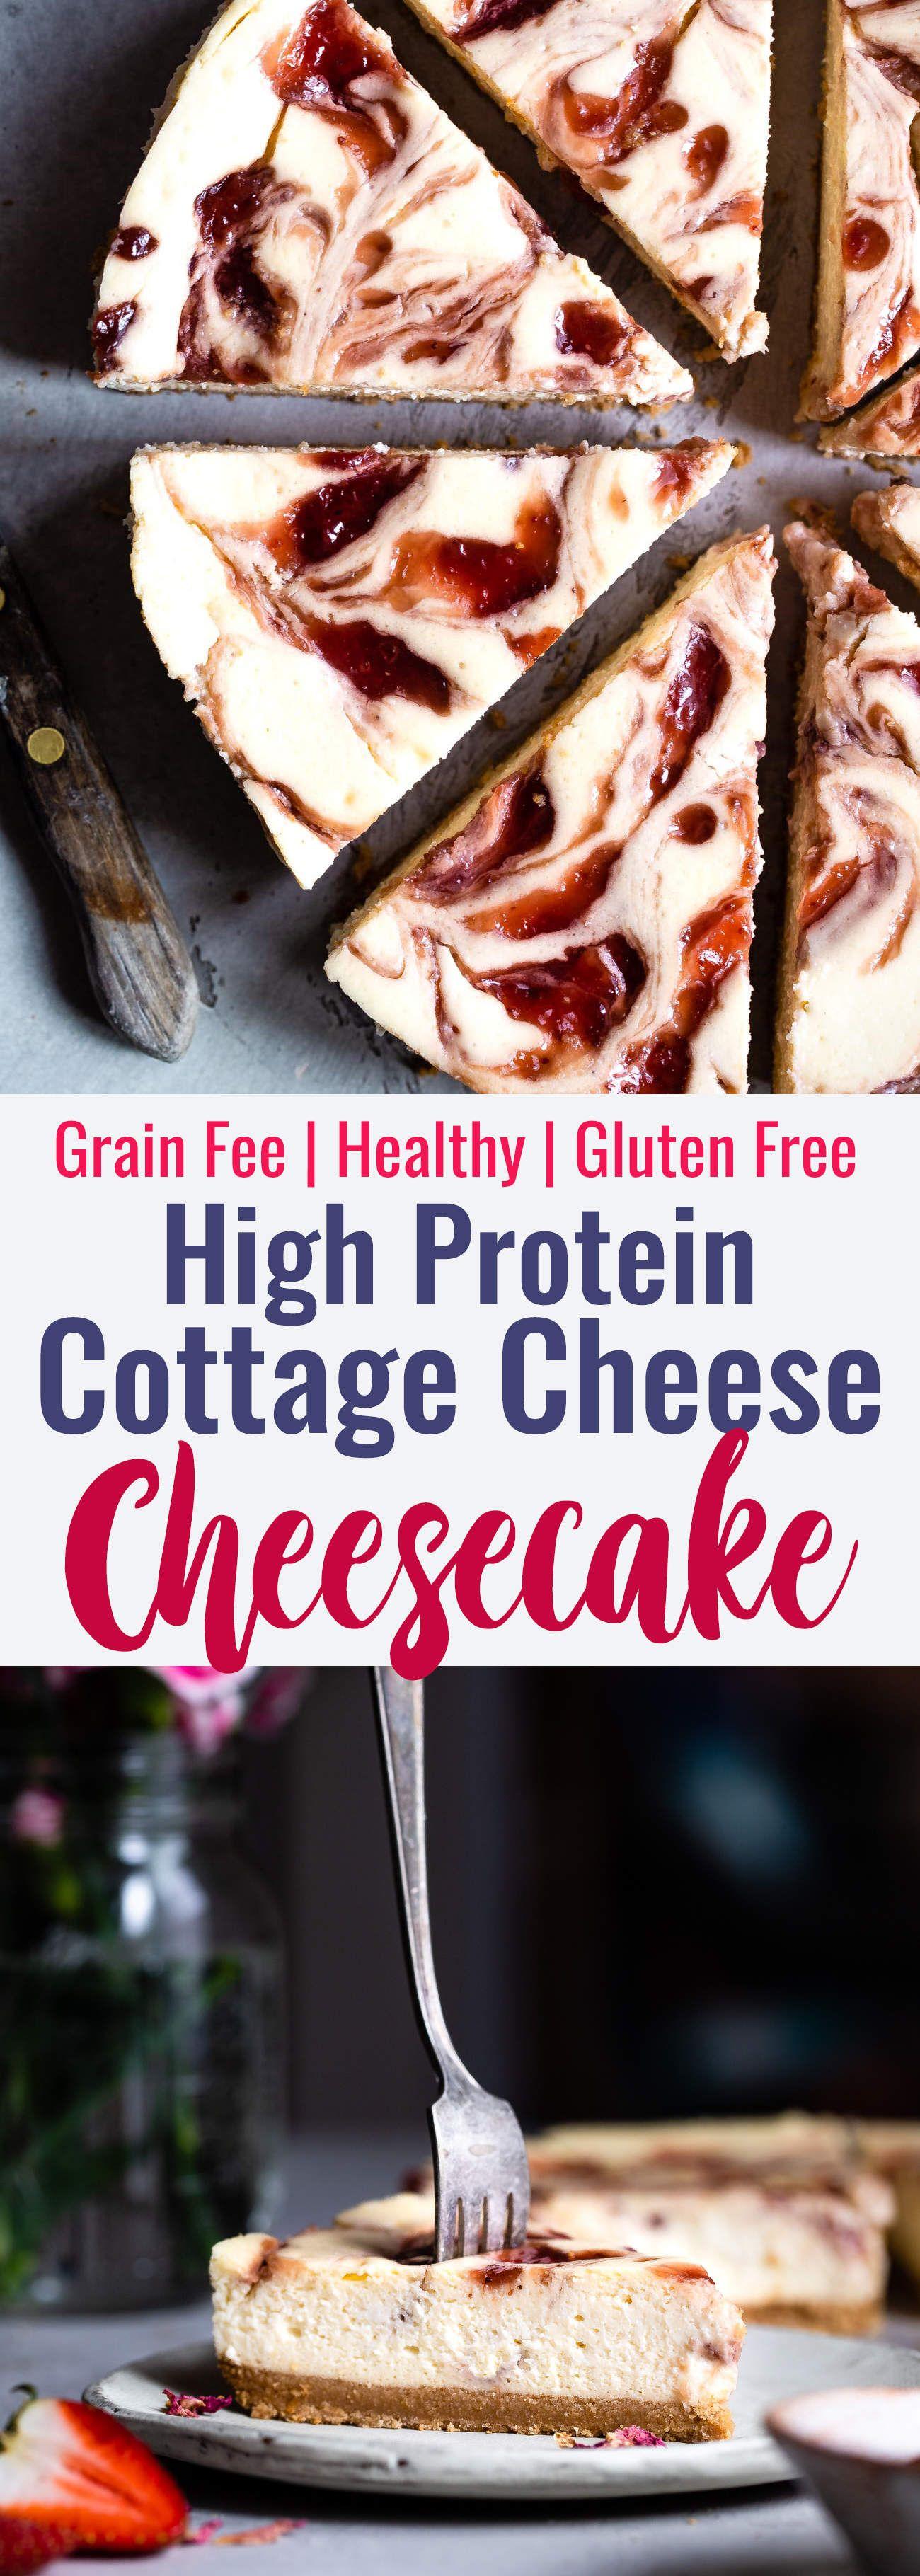 Gluten free strawberry swirled cottage cheese cheesecake